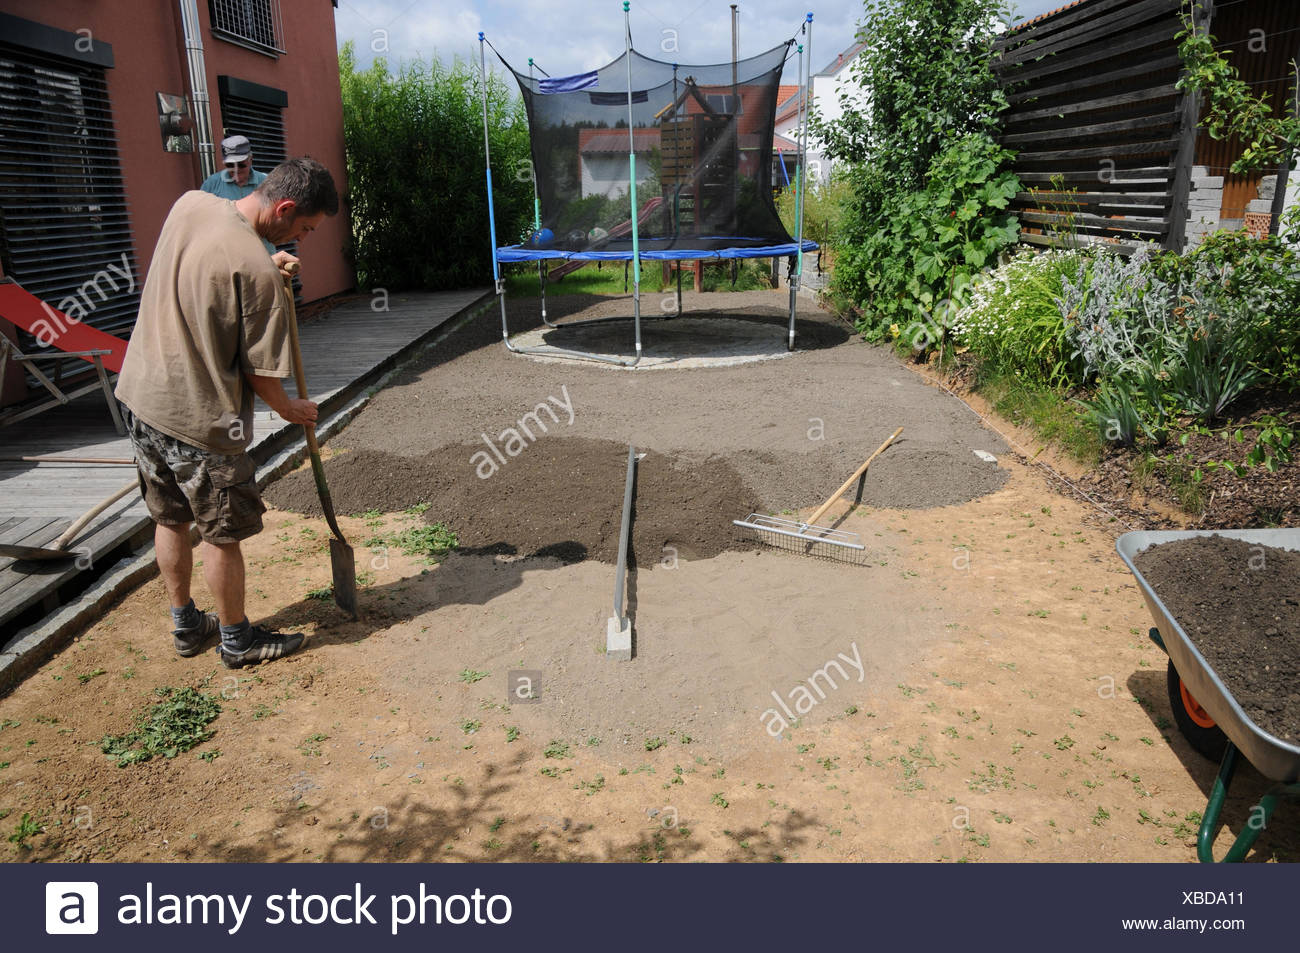 Laying sod, preparing soil Stock Photo